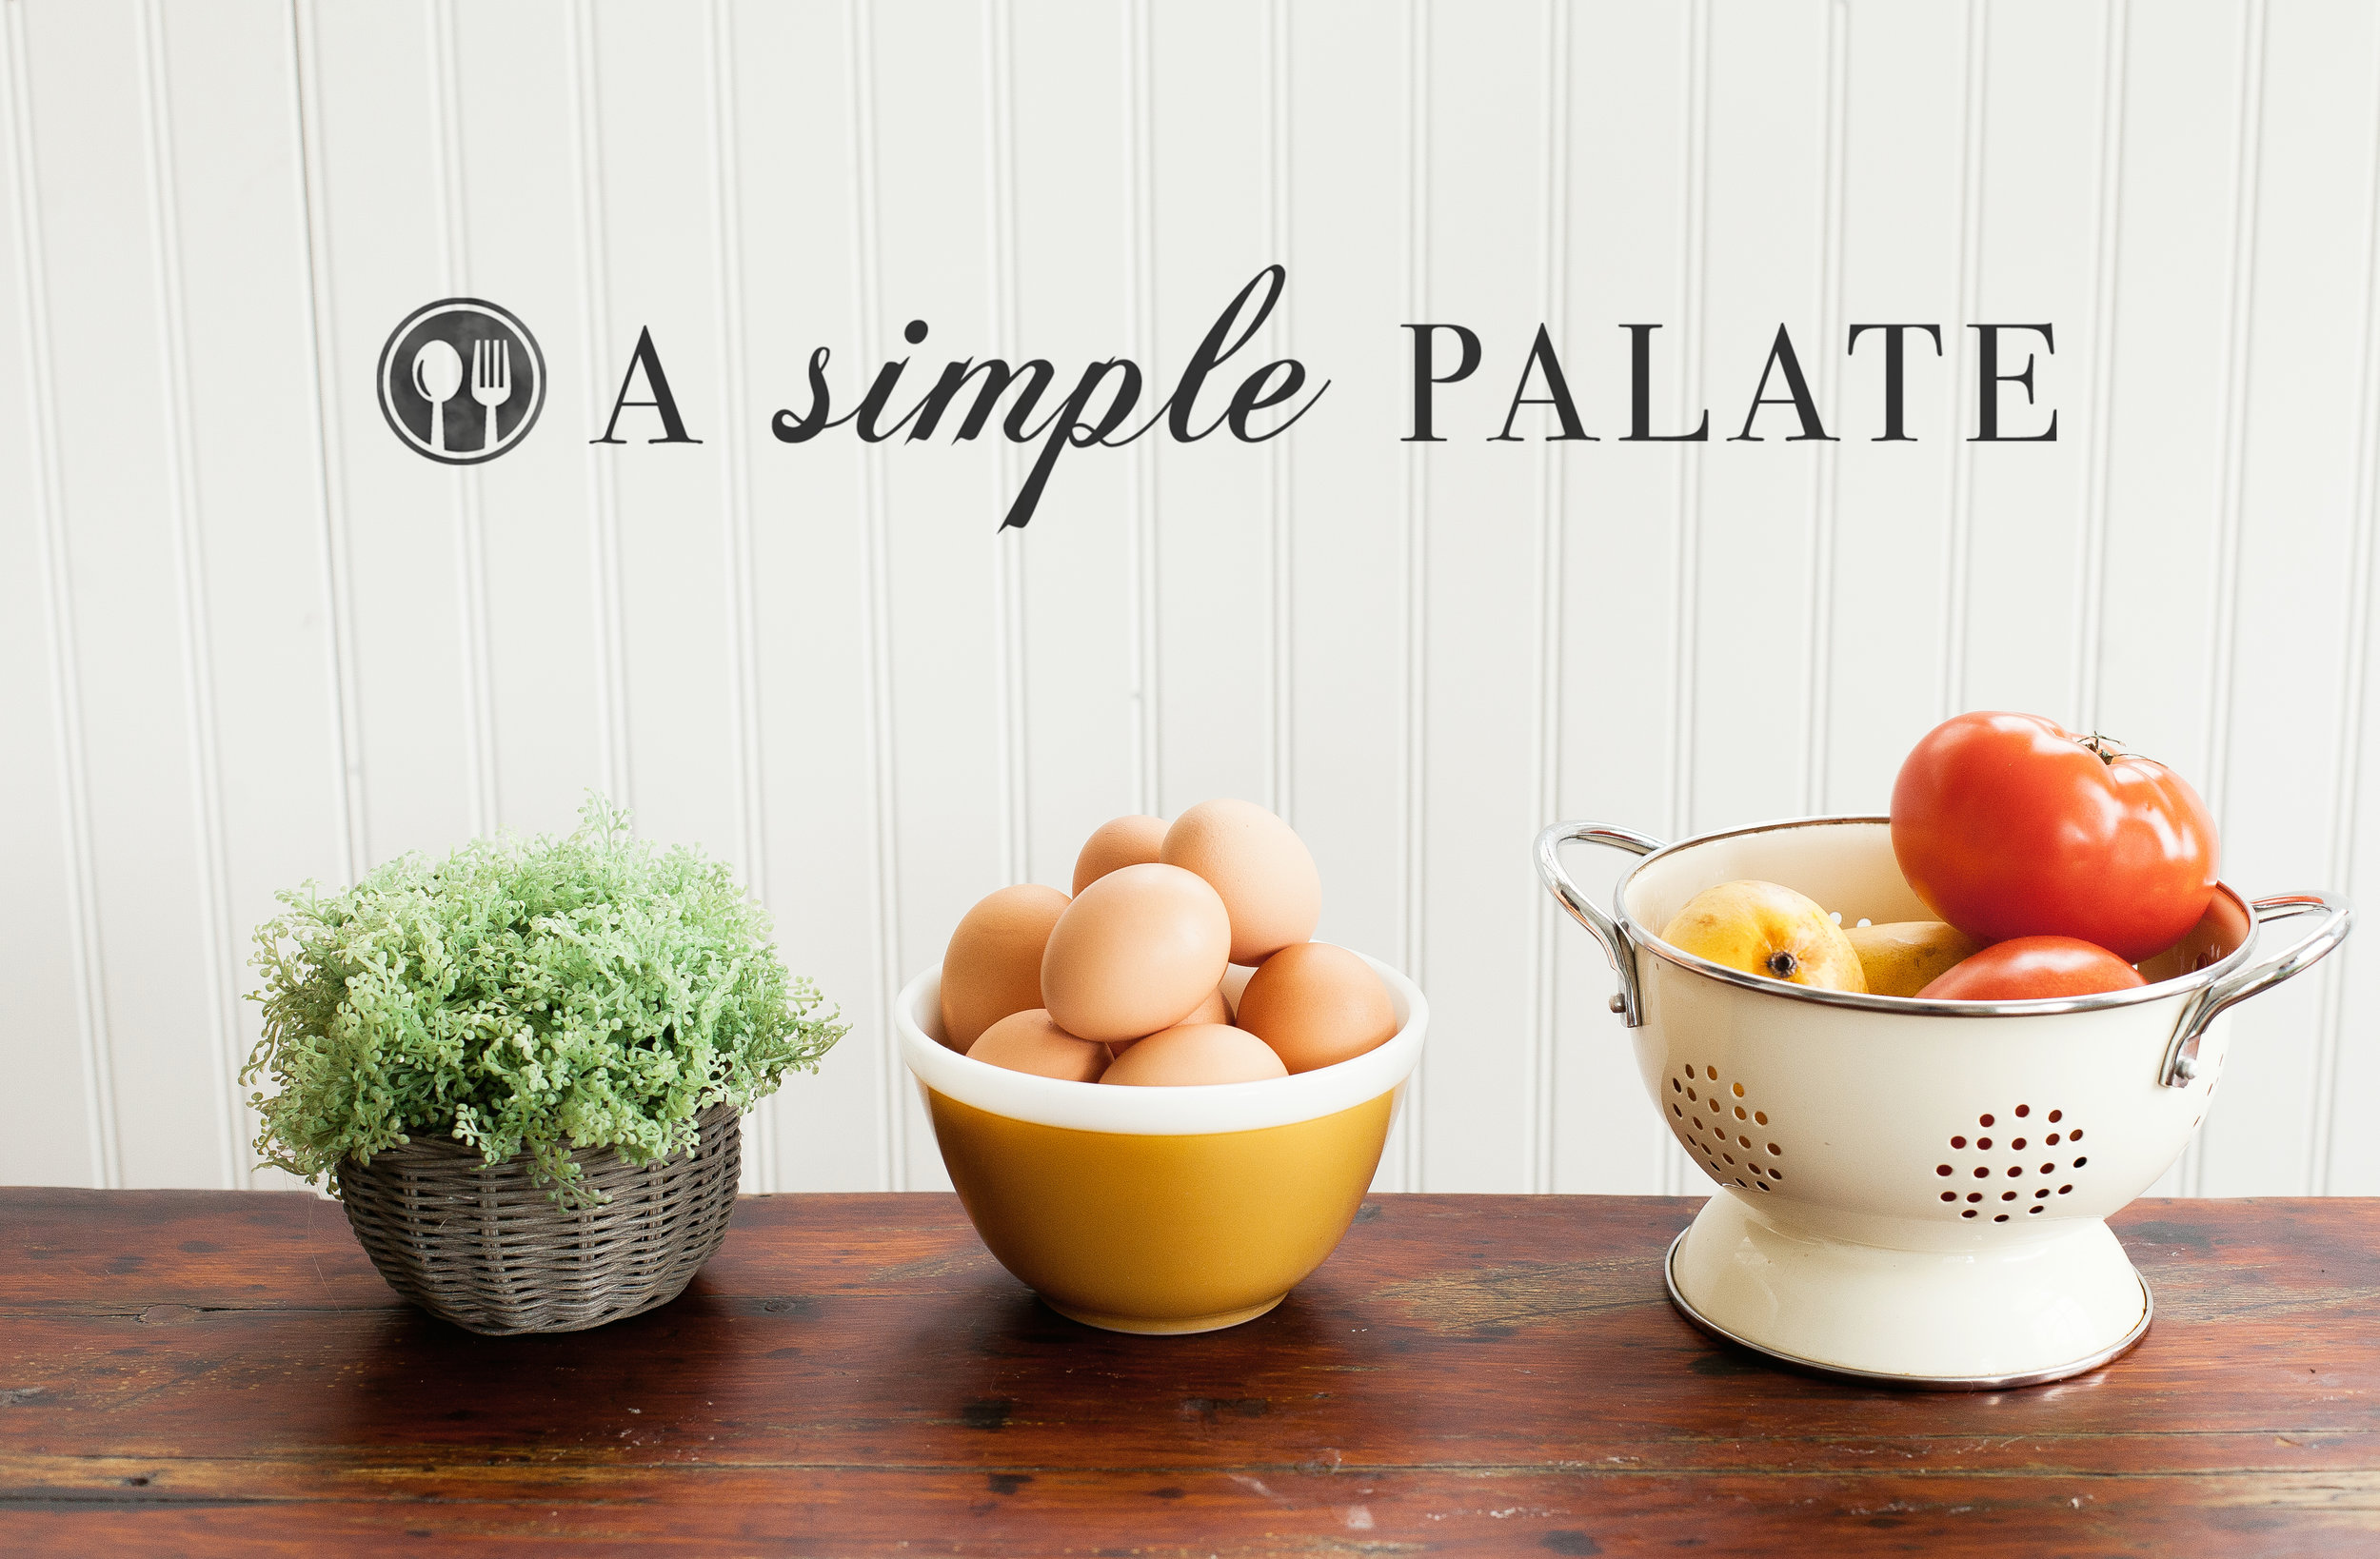 A Simple Palate